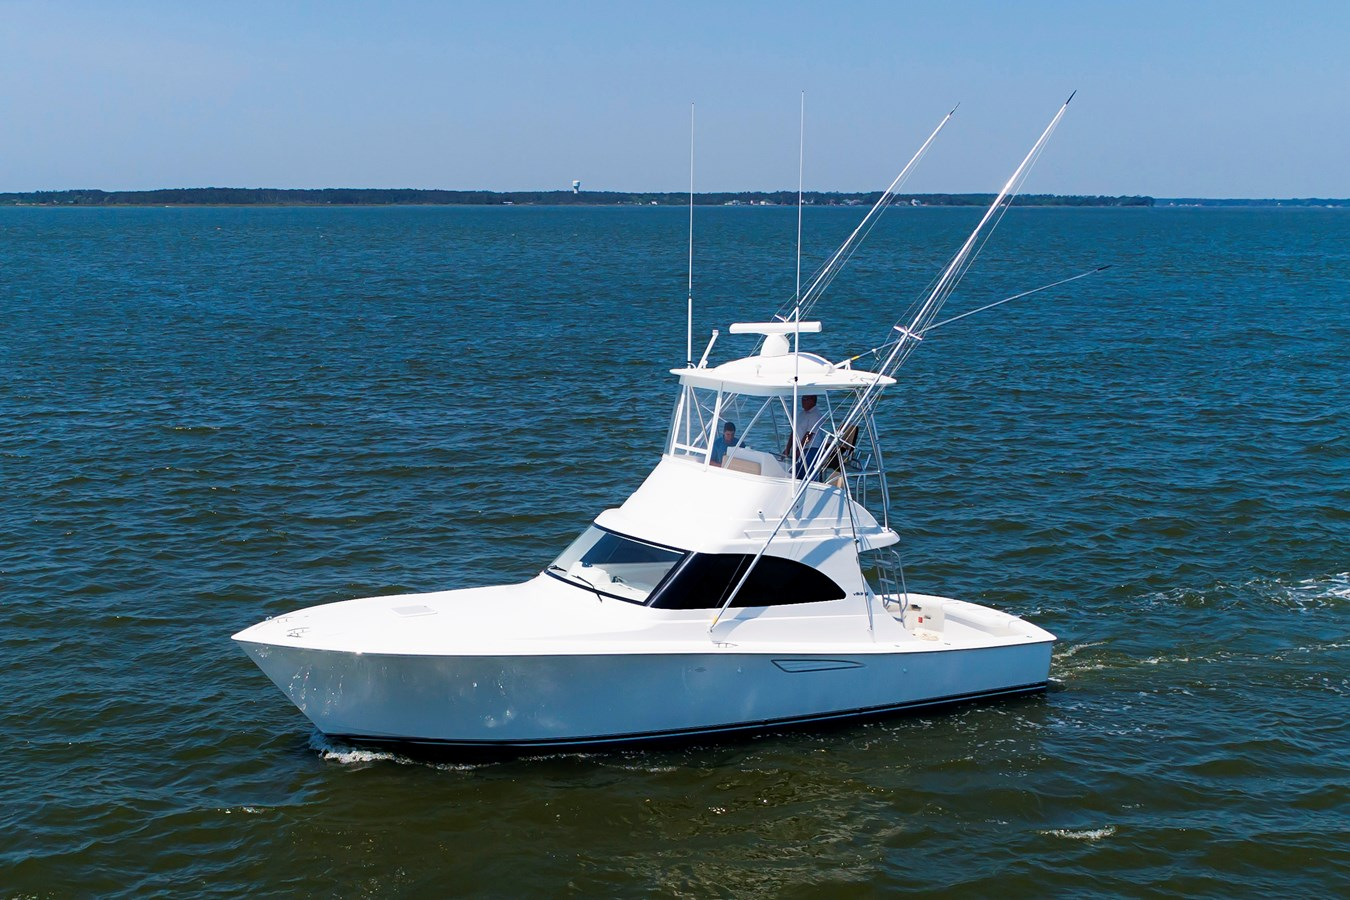 Viking 38 Billfish Port Profile - 38 VIKING For Sale